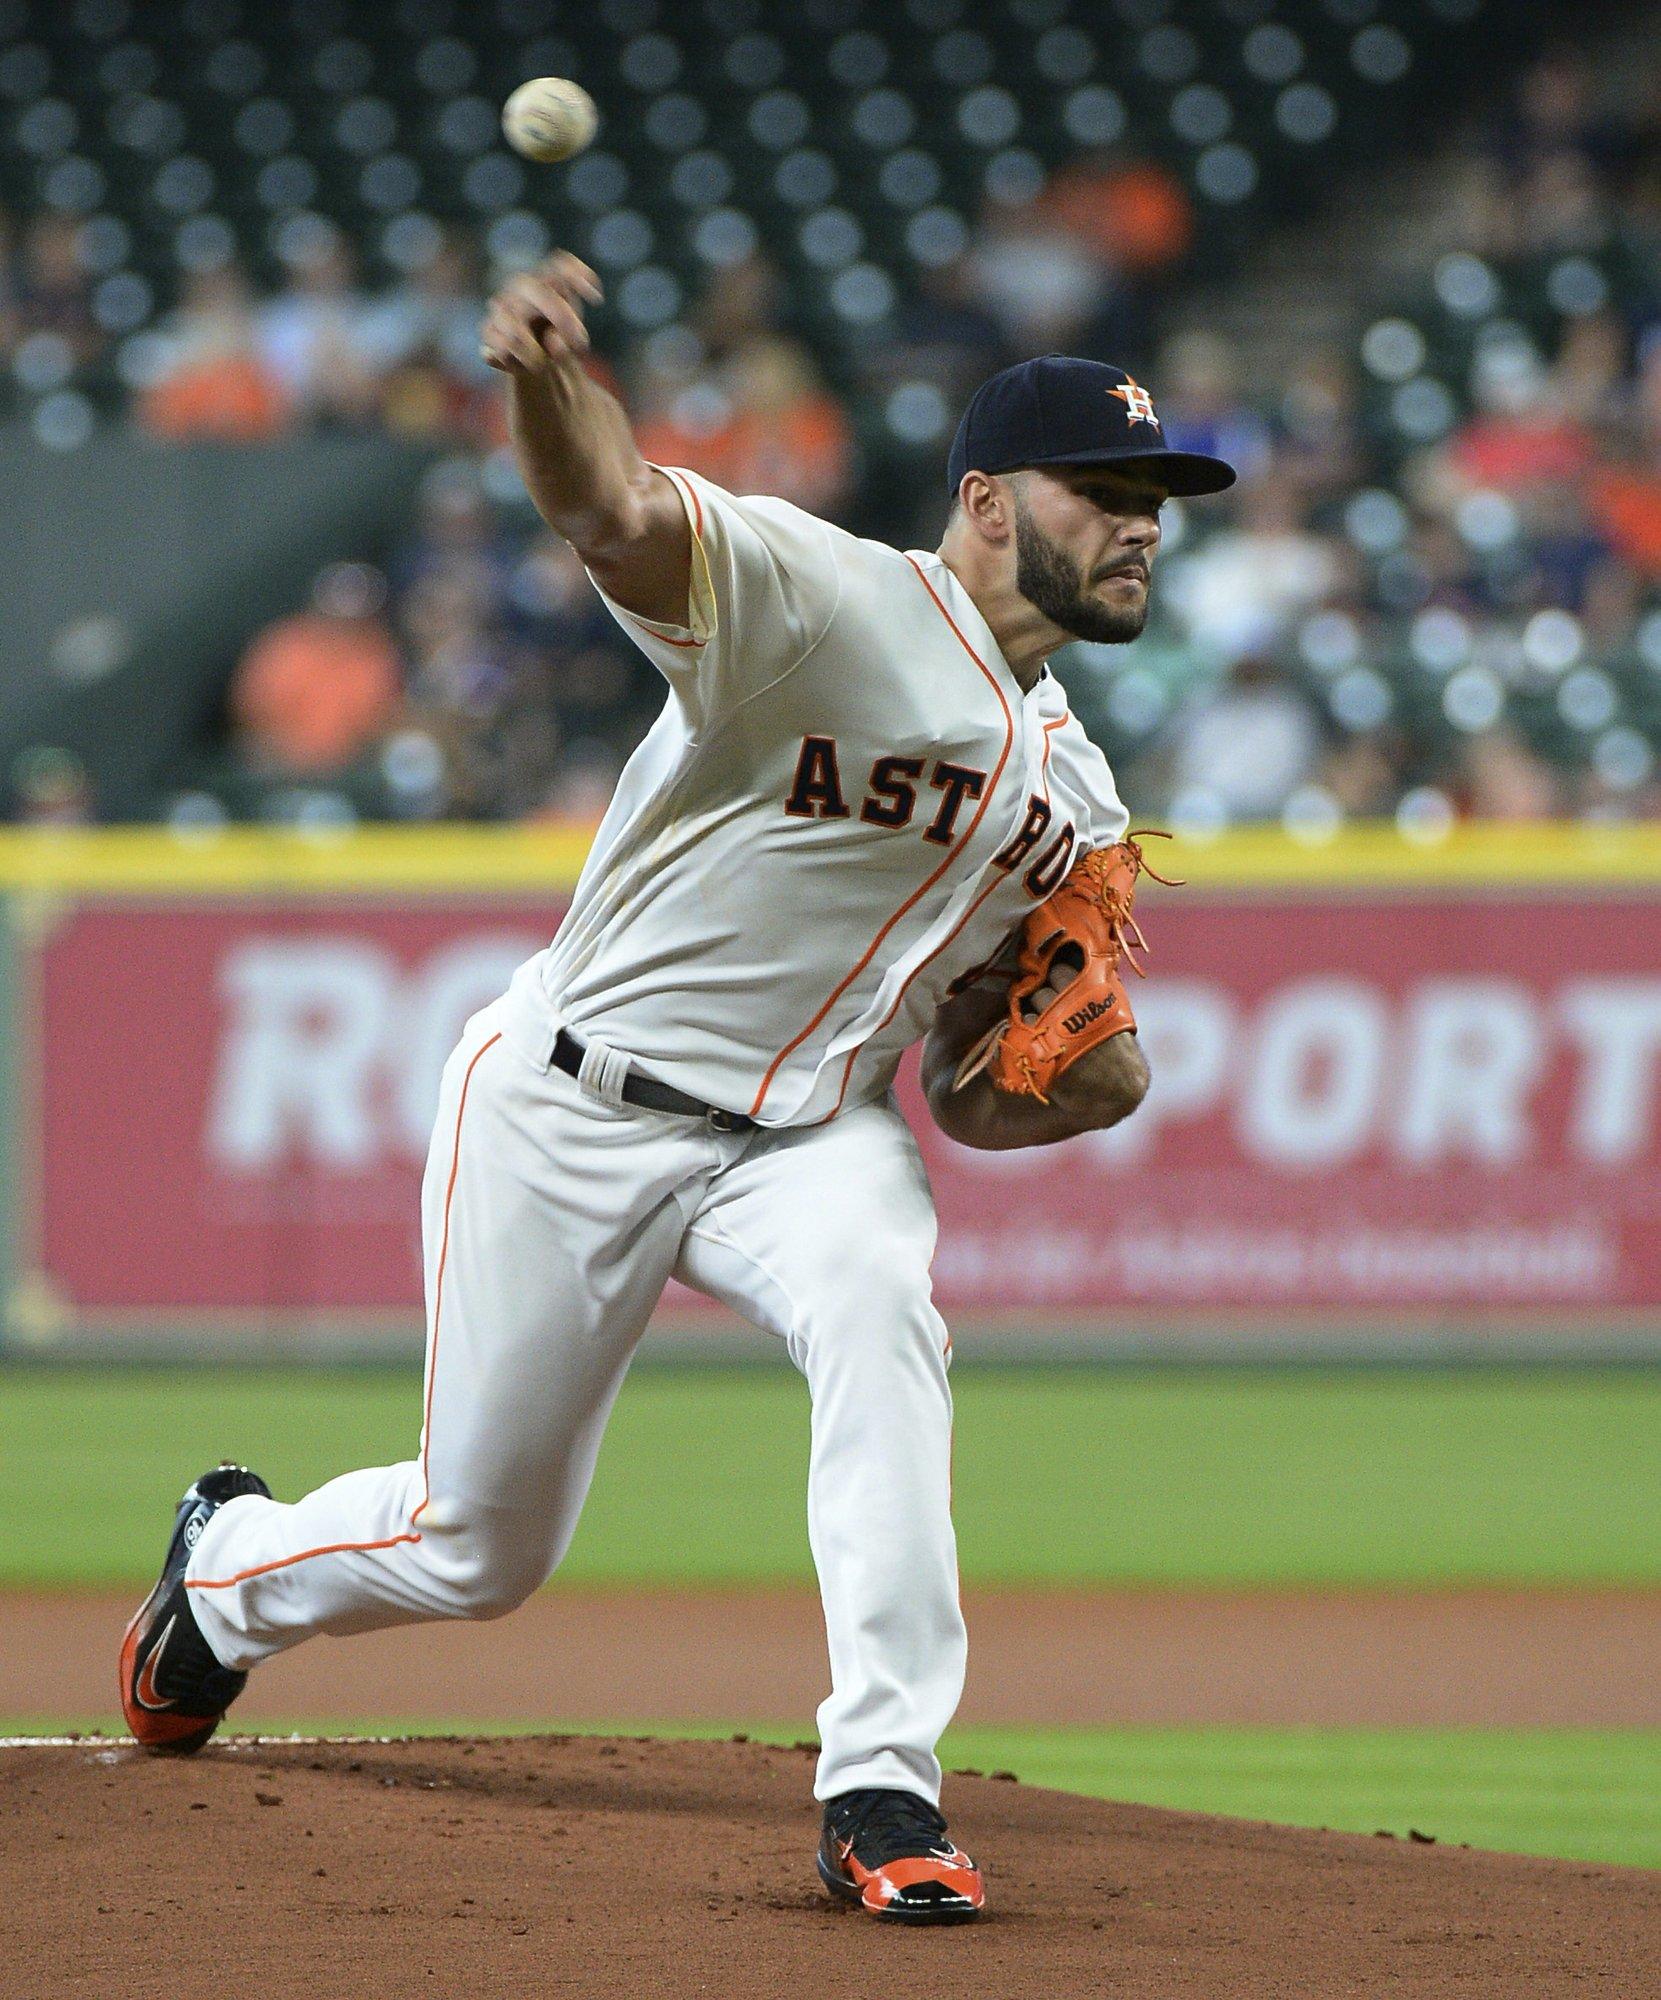 Beltran S First Houston Homer Helps Astros Top Angels 2 1